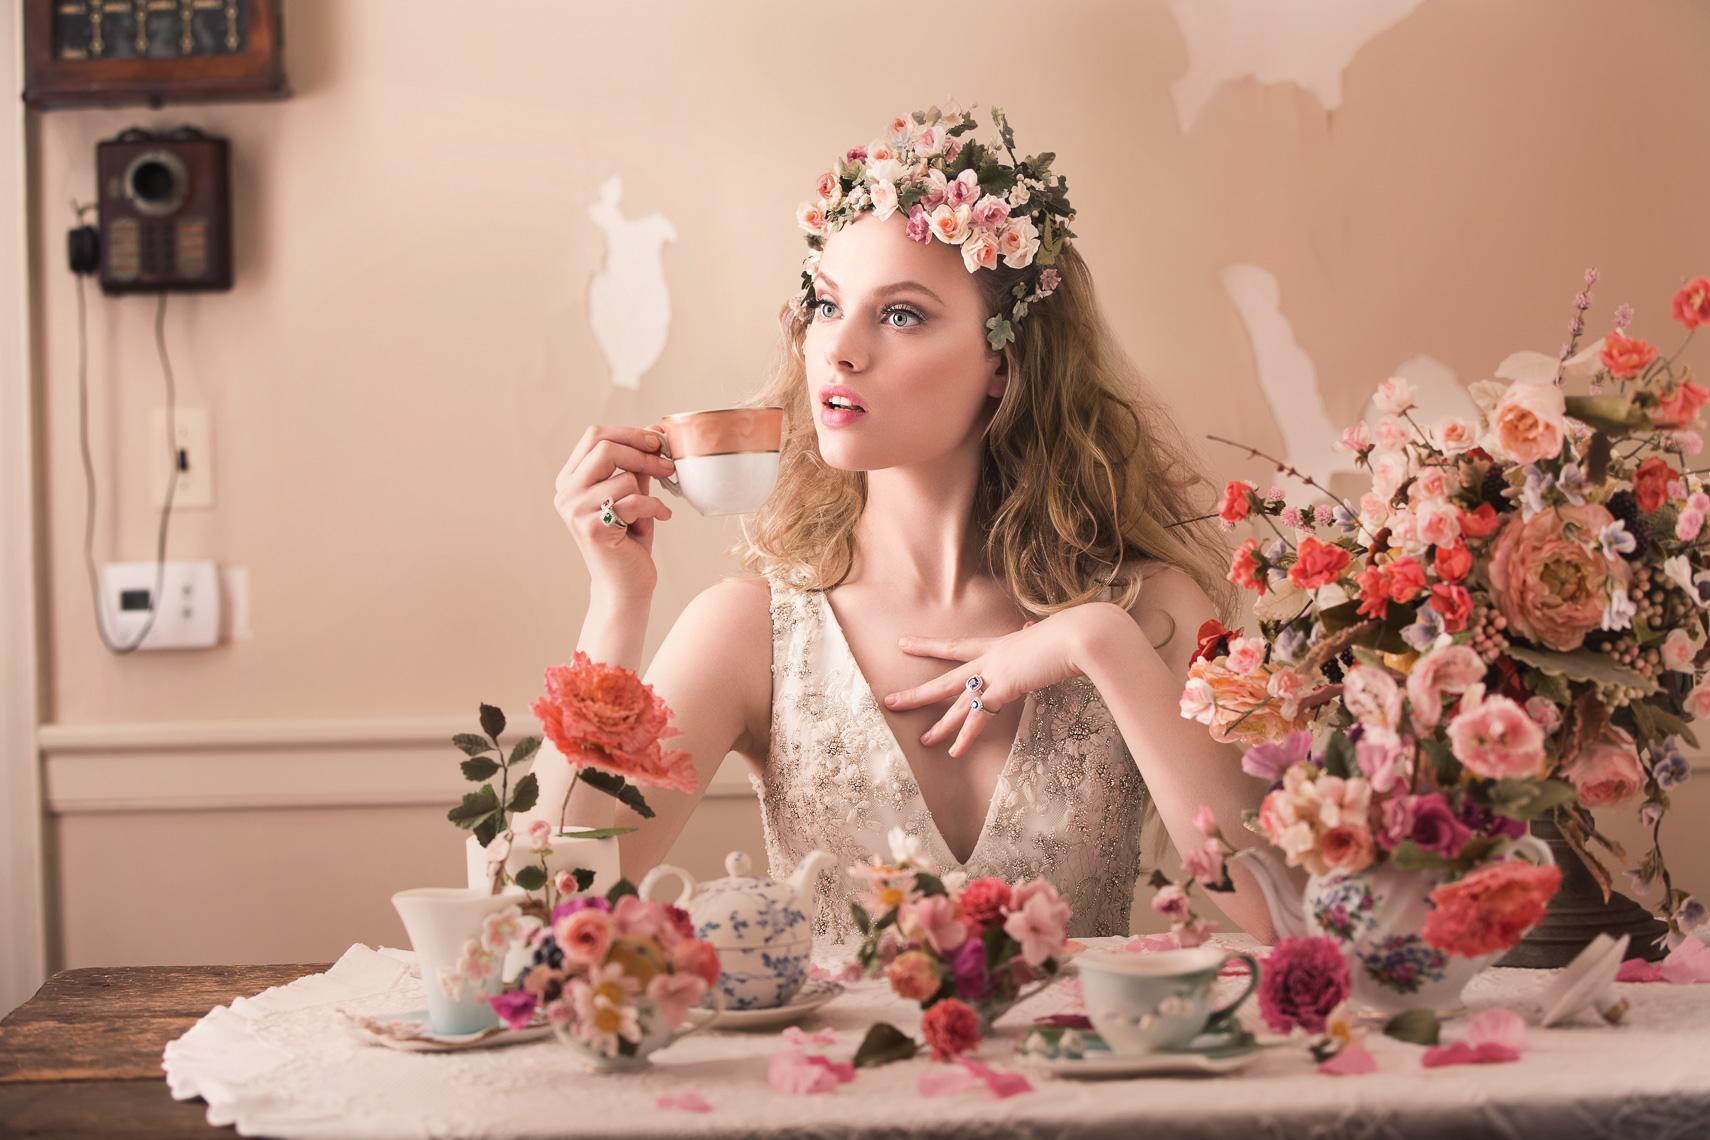 Washingtonian Bride & Groom - All Dolled Up - tea